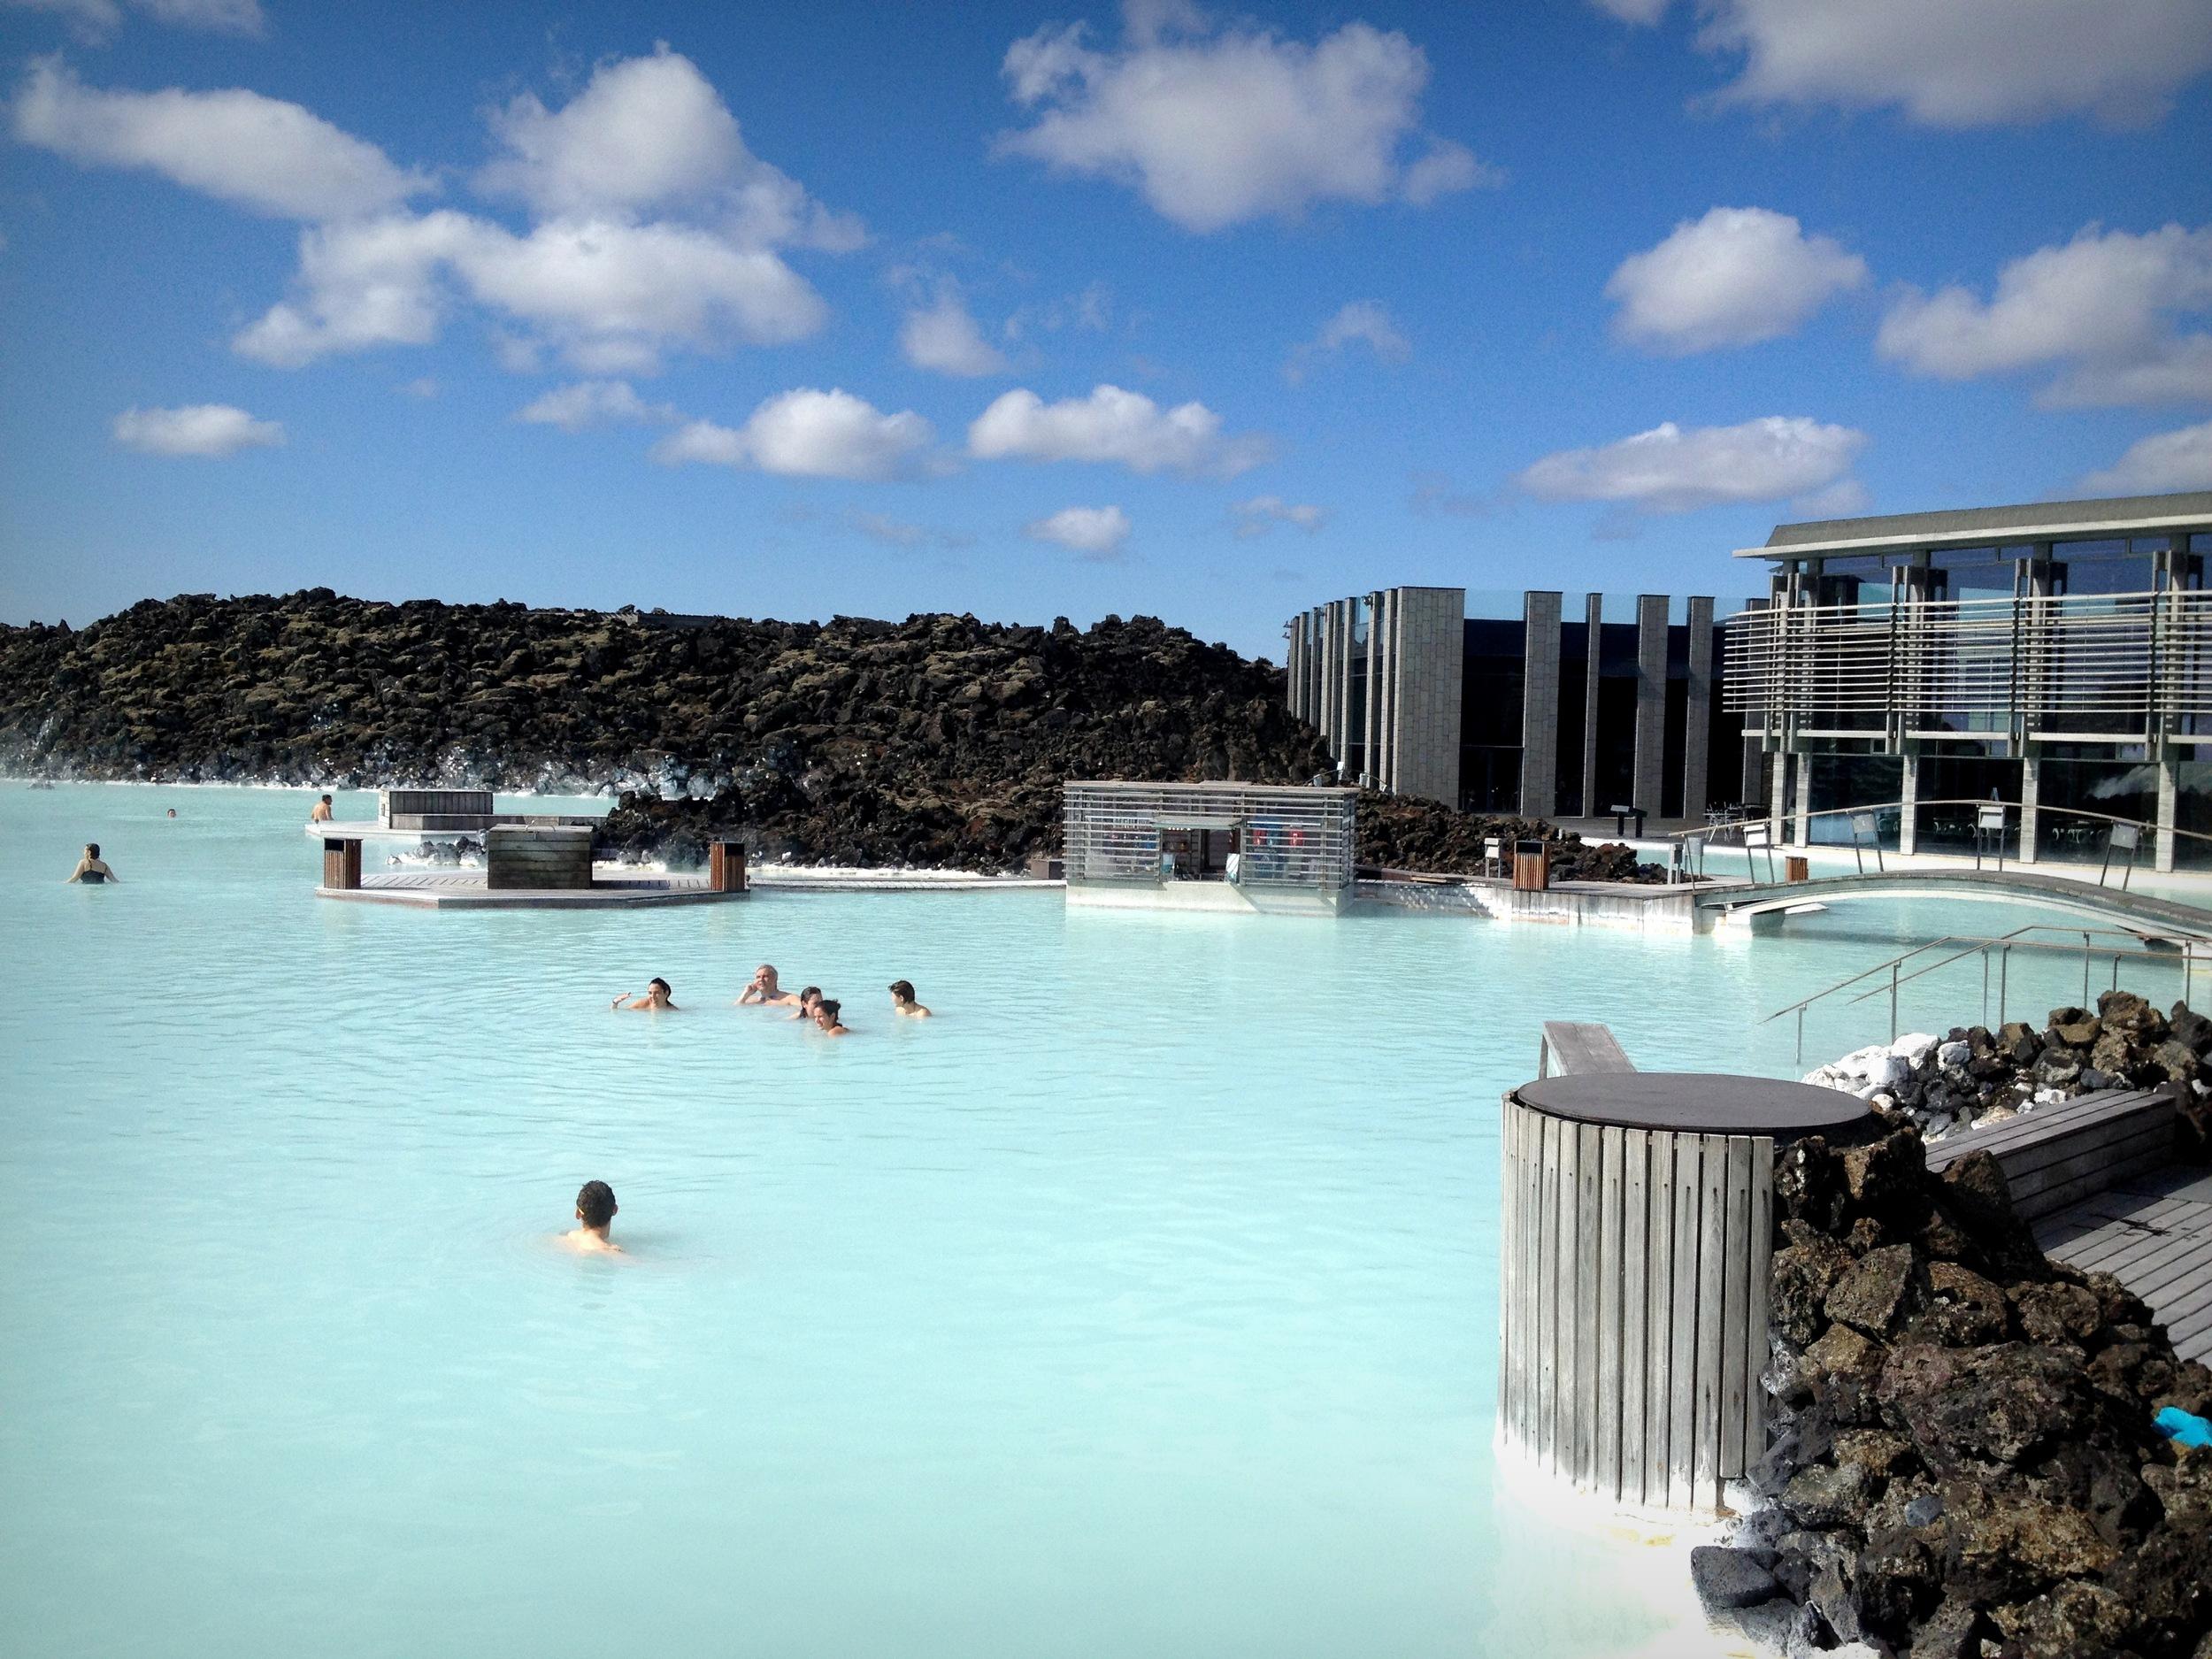 12. Blue Lagoon – Iceland